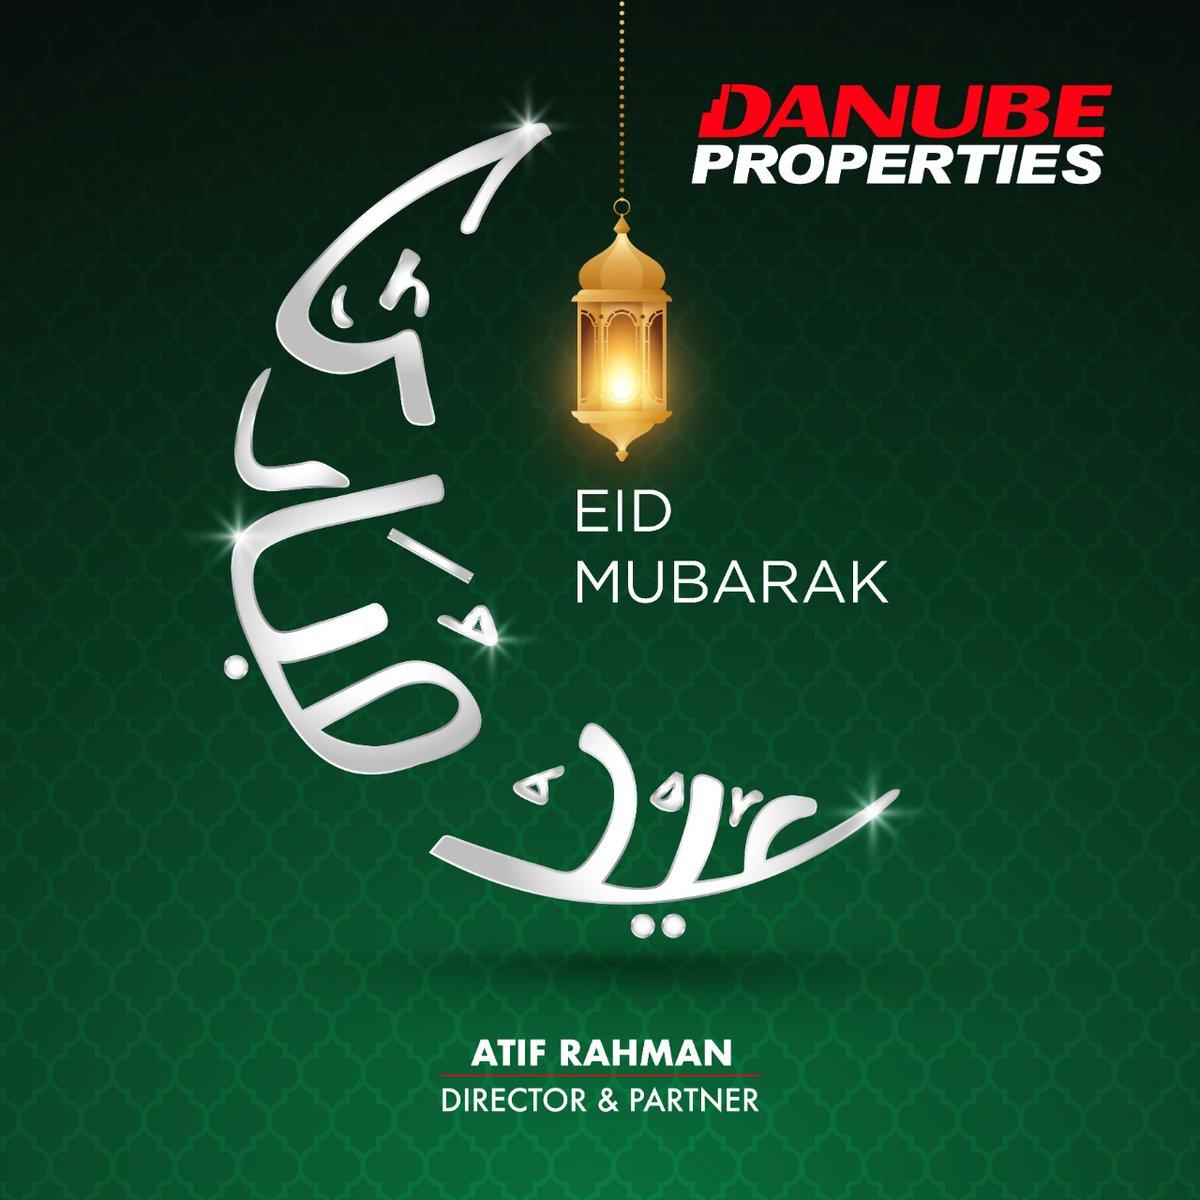 We Wish You & Your Family a Blessed Eid Al Fitr! STAY HOME - STAY SAFE - STAY BLESSED   #Eidmubarak  #Familytime #EidAlFitr2020  #Danubeproperties  #Dubai #Mydubai #Atifrahman  #Safehands #Thinkpositive #Socialdistancing #UAEFightsCovid19 #SaveLives #StayHomeStaySafe #StayBlessedpic.twitter.com/2XDbPMHhsJ